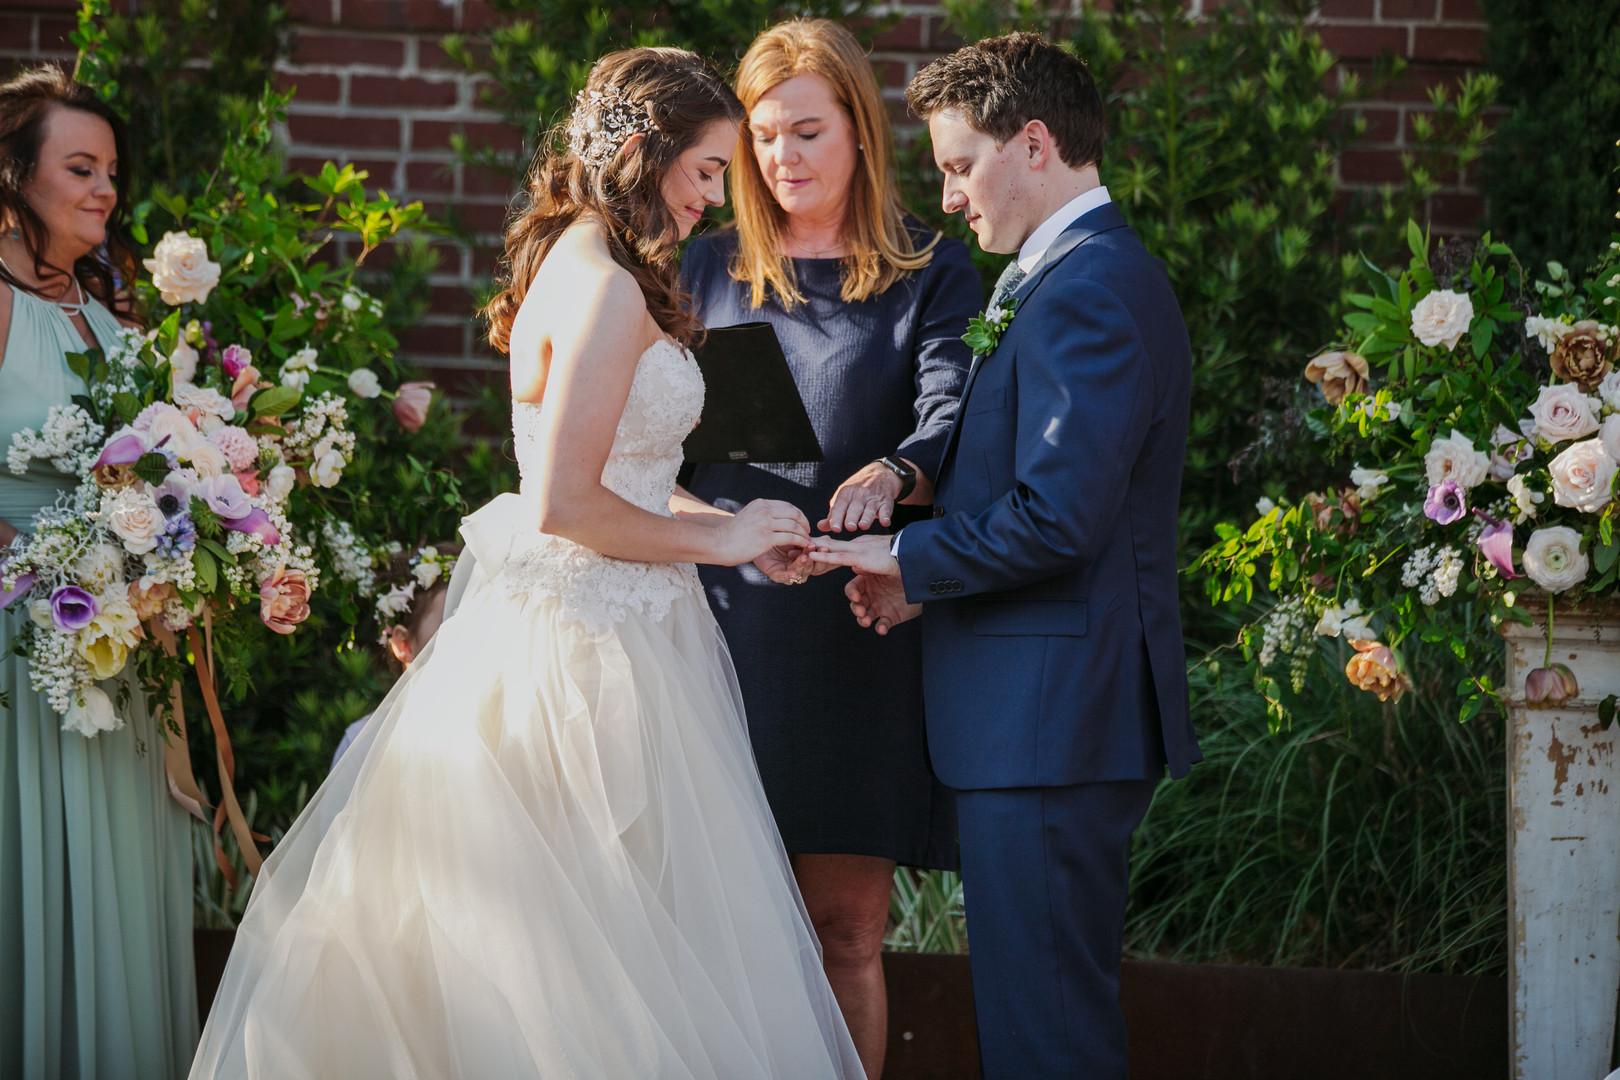 cedar-room-wedding-12.jpg